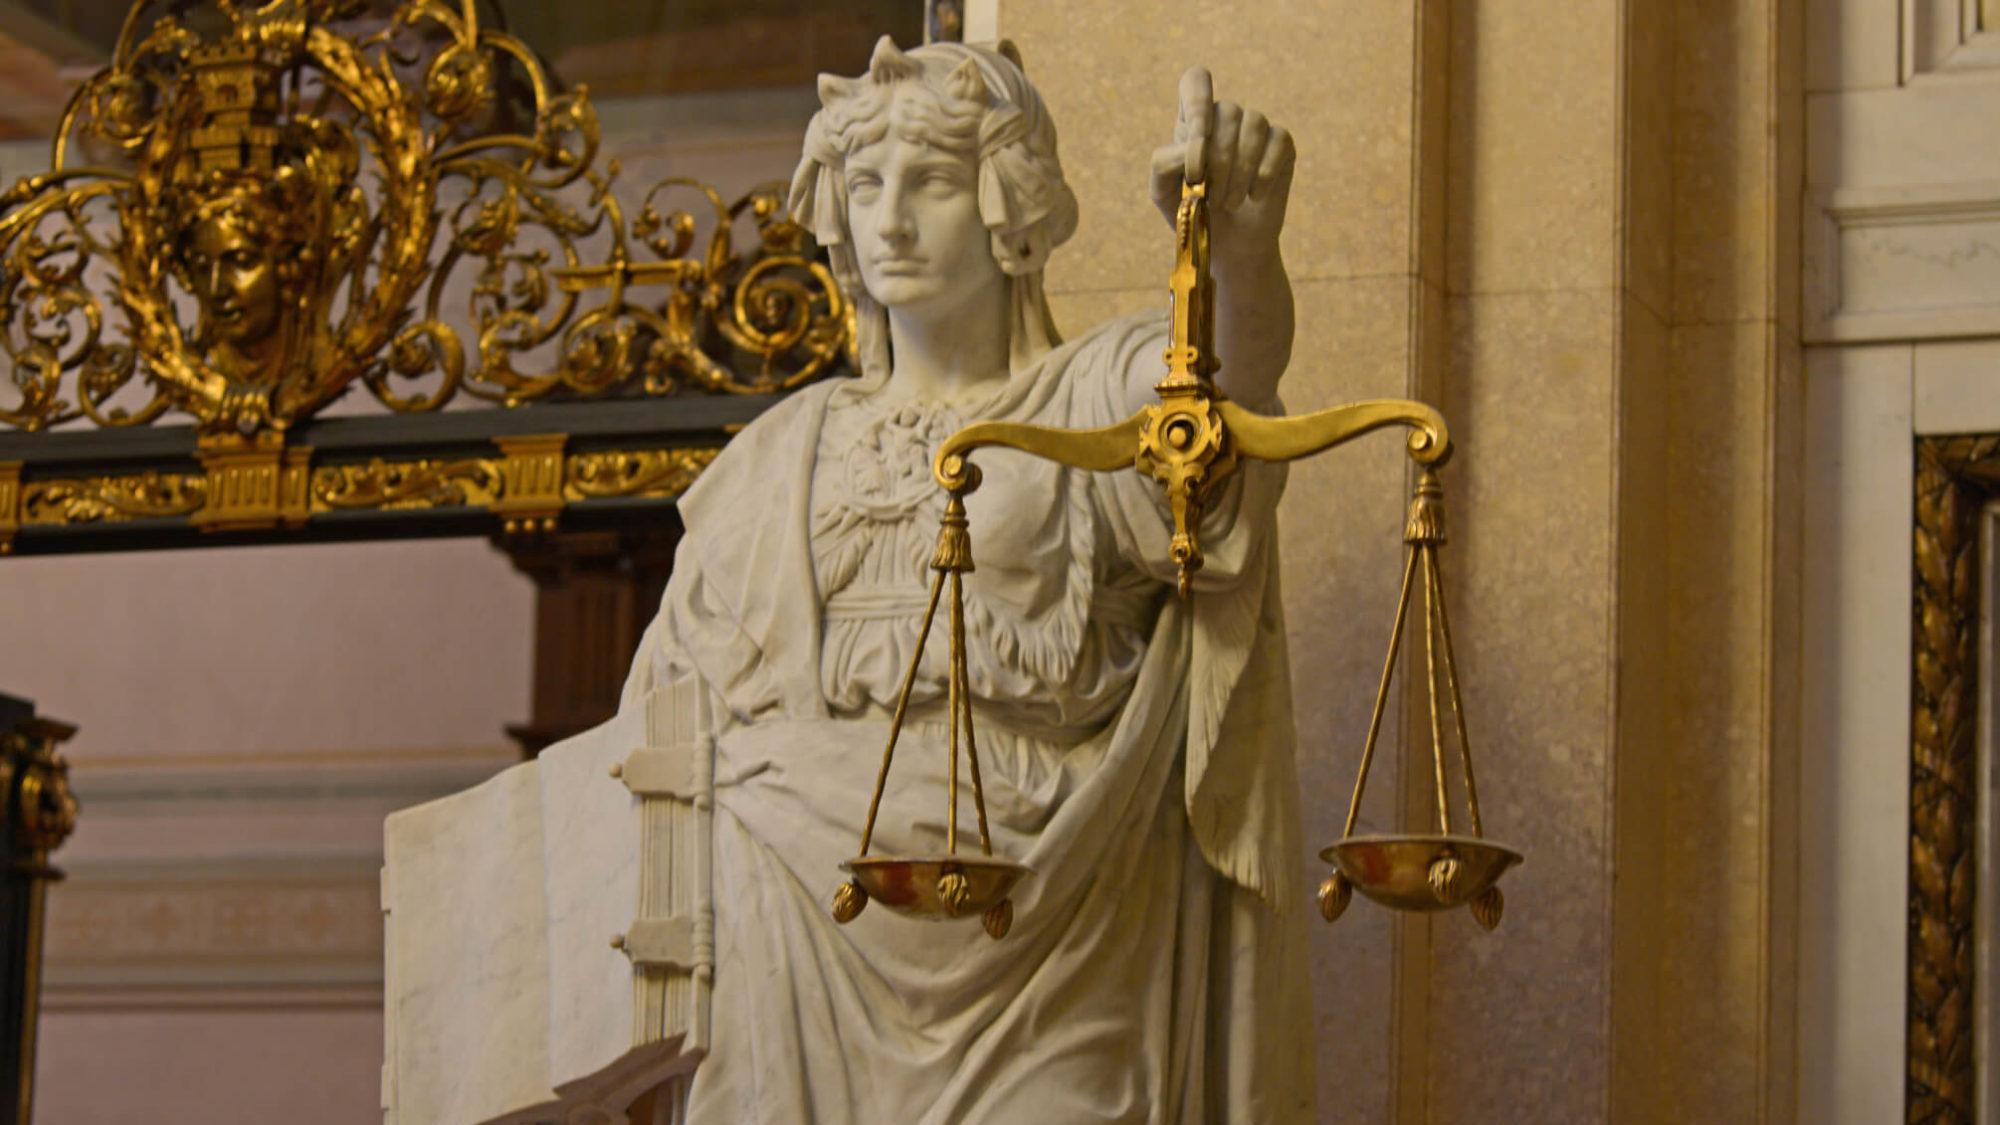 Justizia Justizbehörde Hamburg - Blog Till Steffen - Foto: Marco Lange